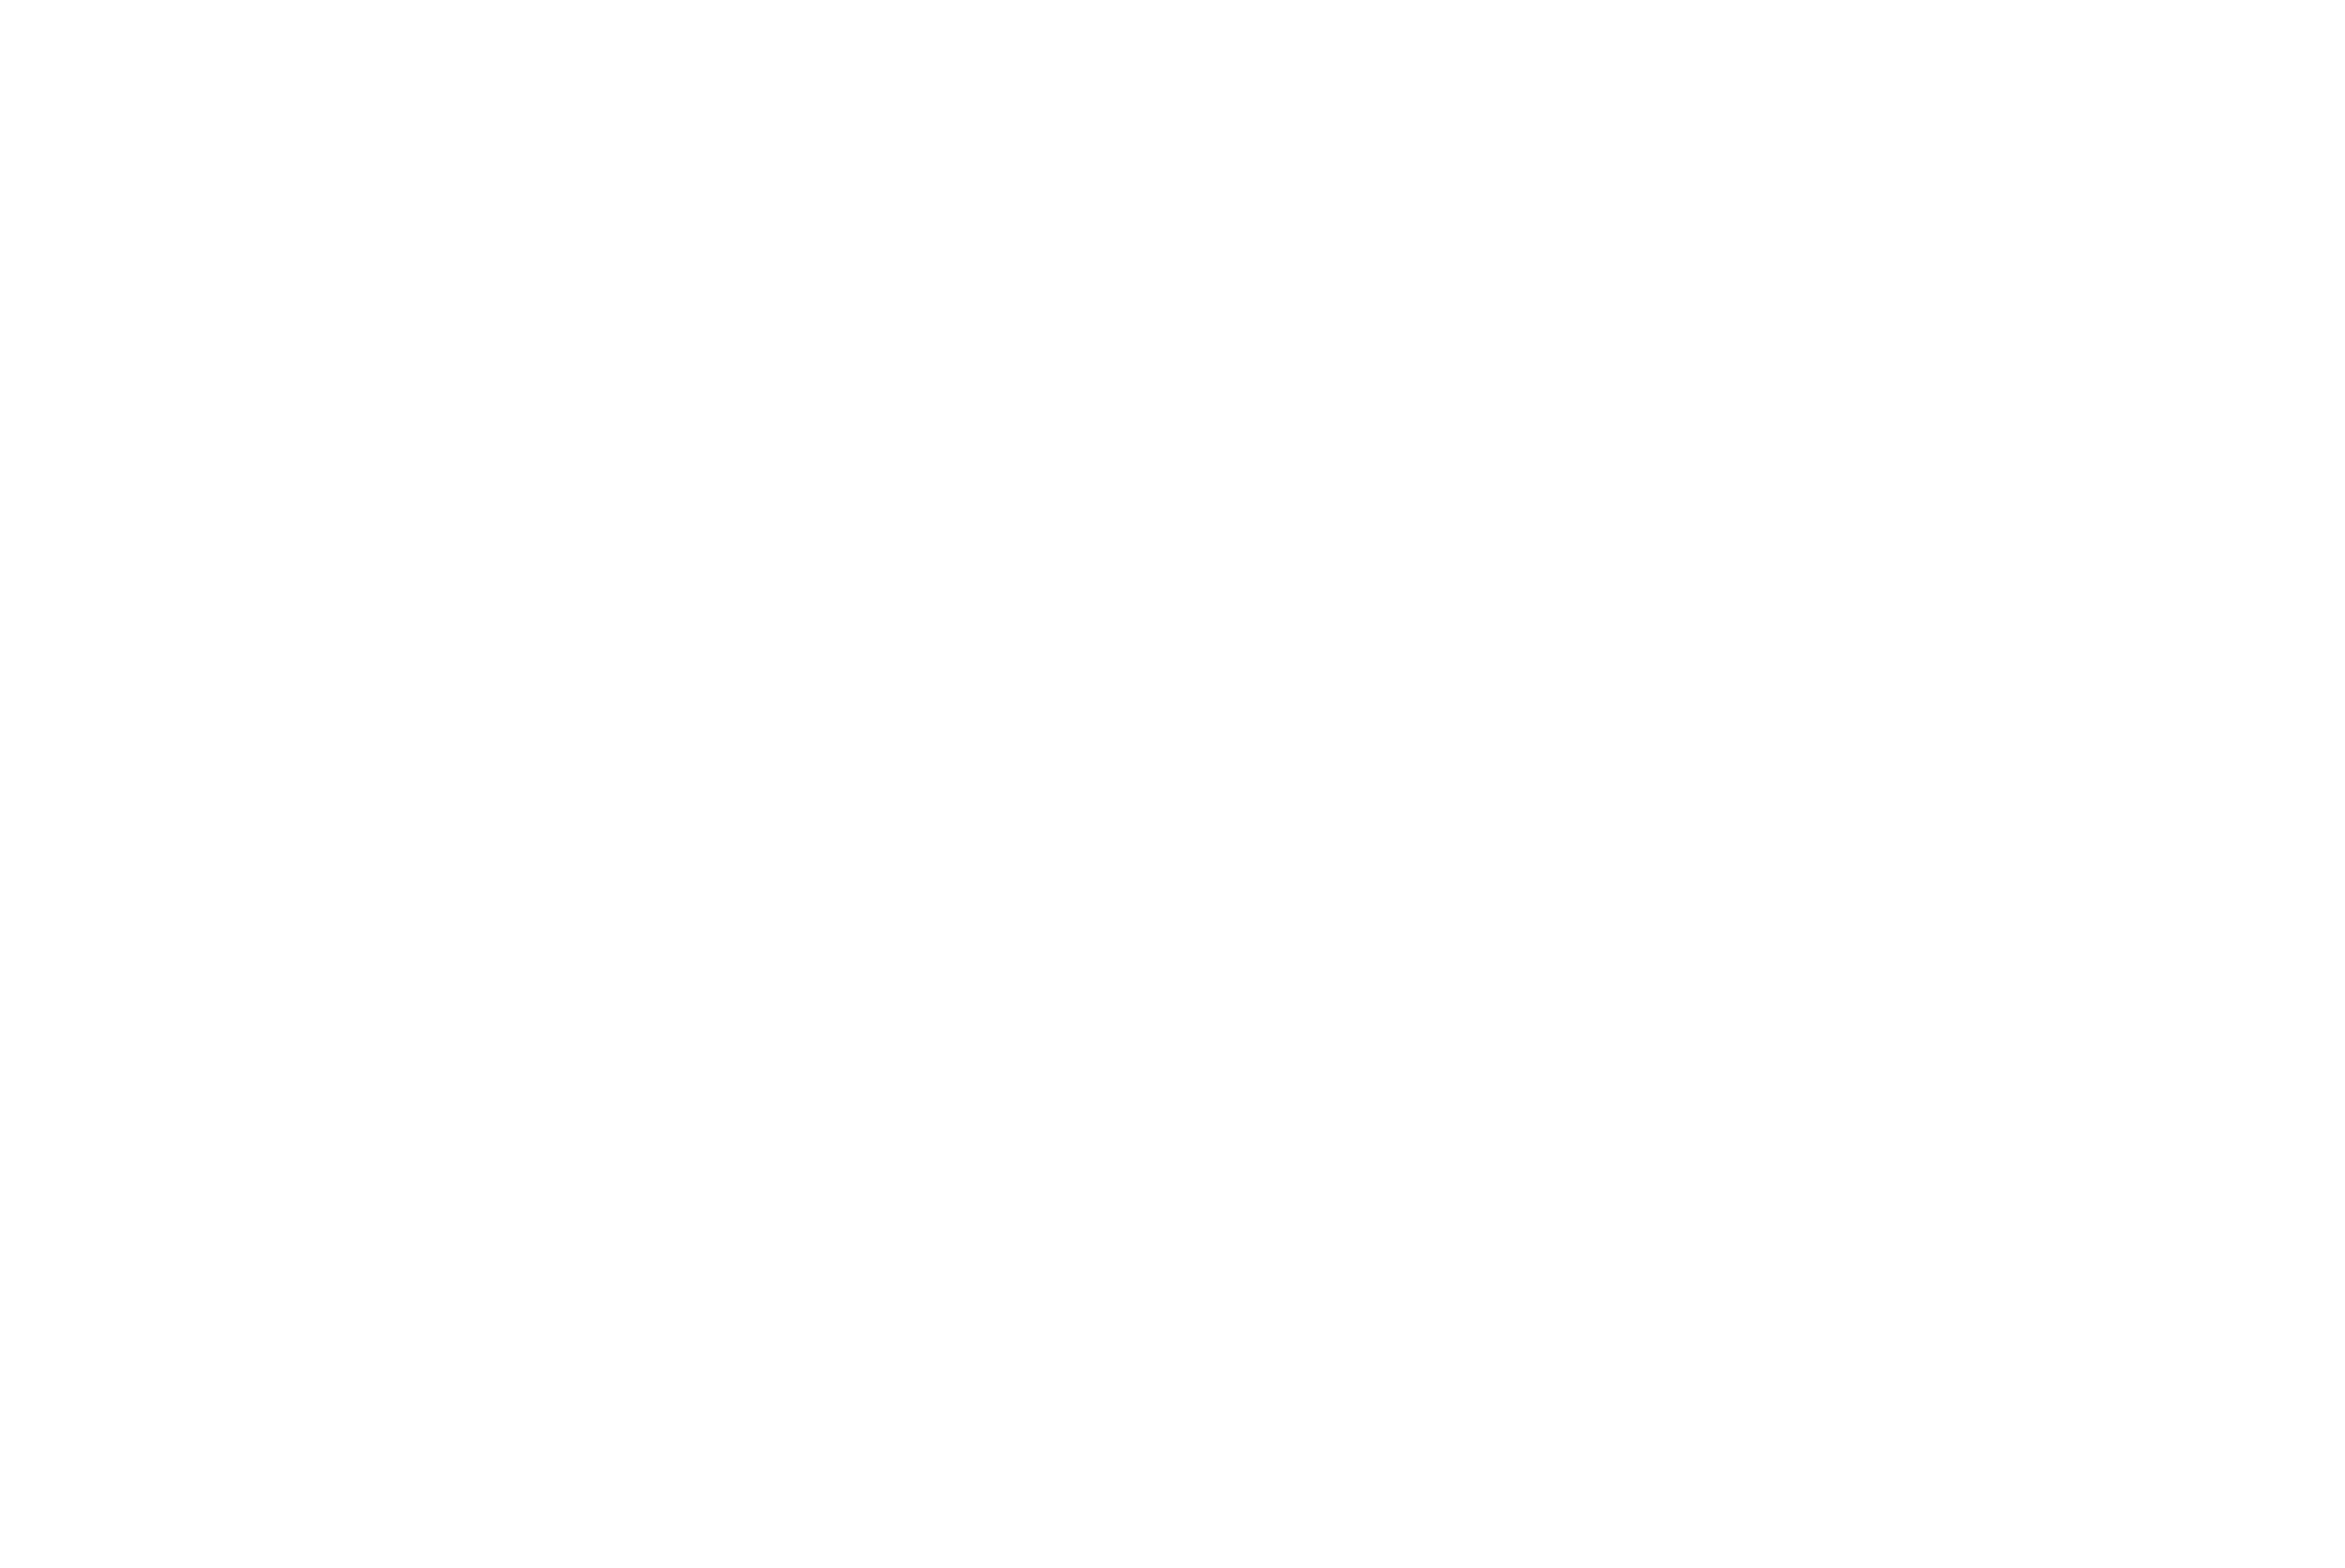 Brylle Bryghus